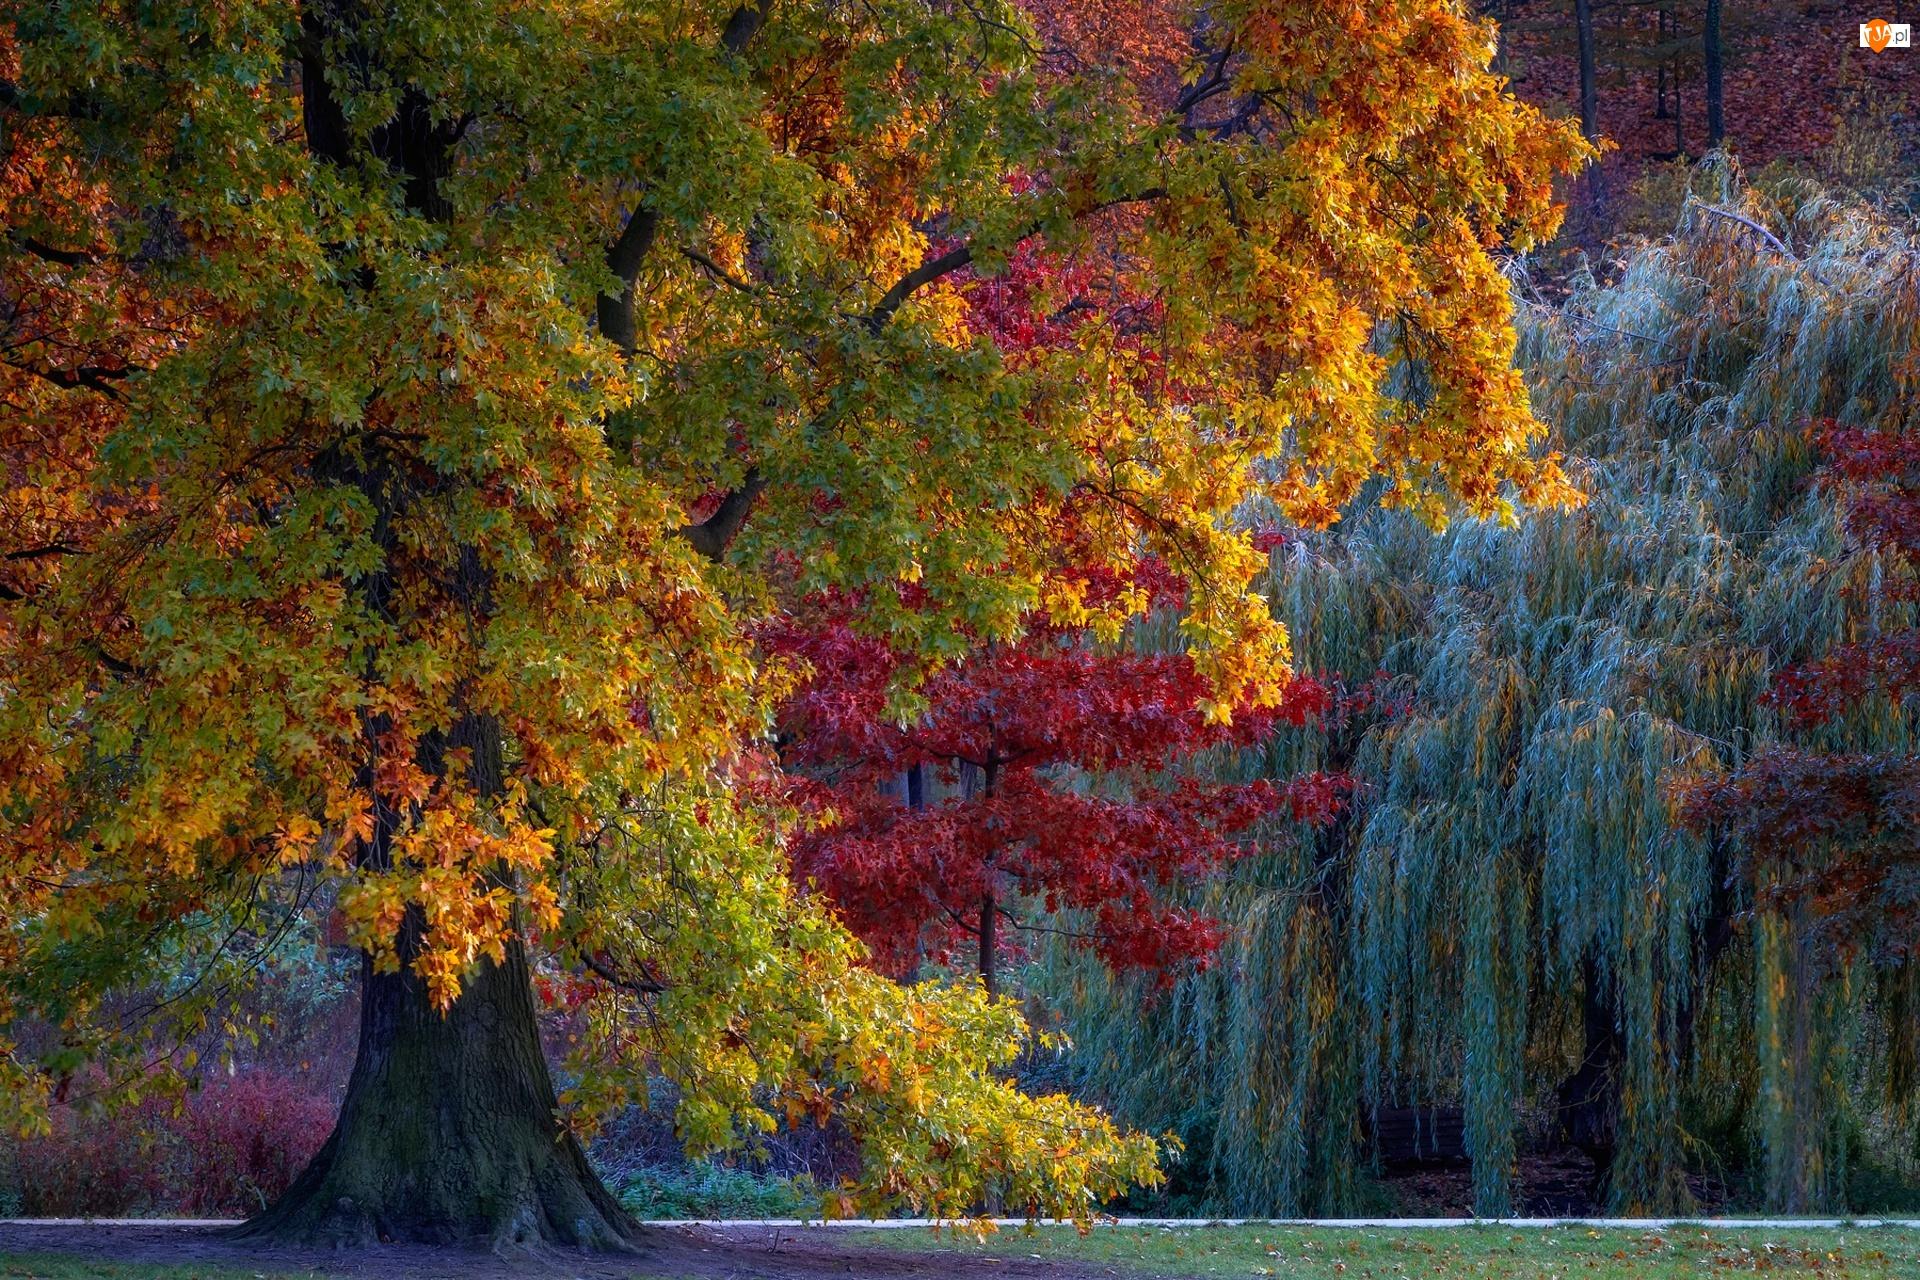 Drzewa, Kolorowe, Jesienne